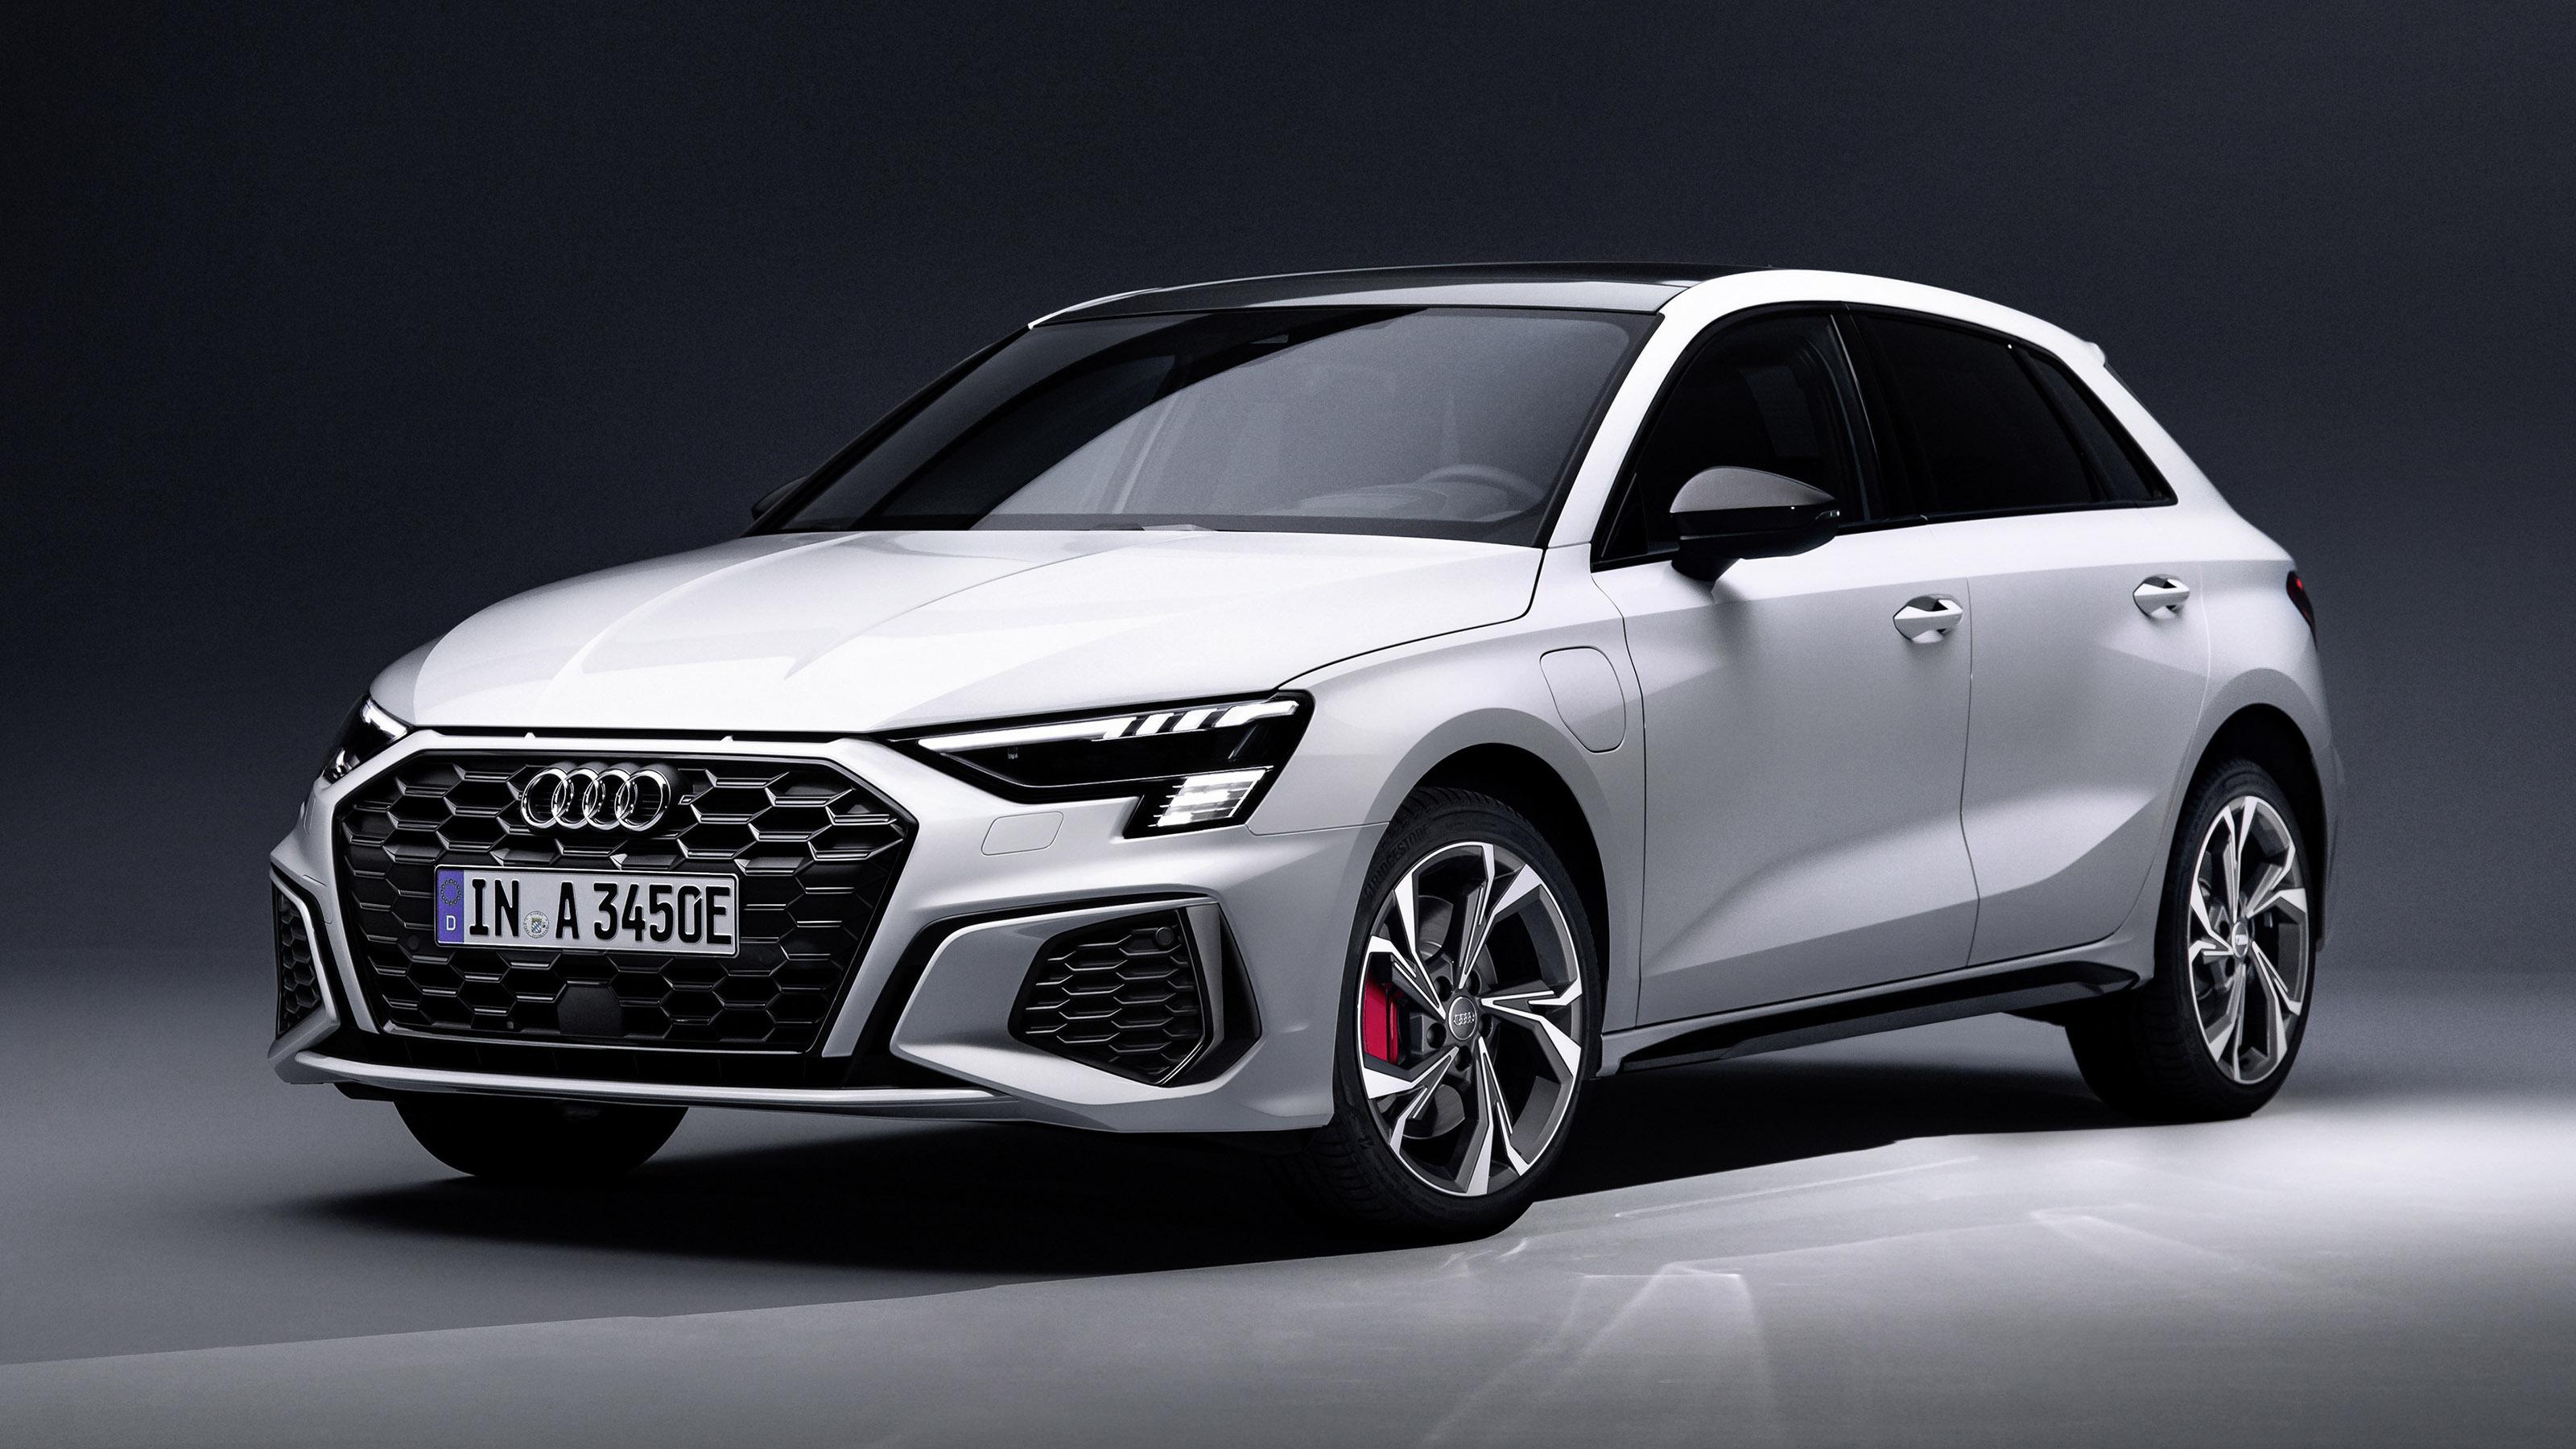 Audi%20A3%2045%20TFSI%20e%20plug-in%20hybrid.jpg